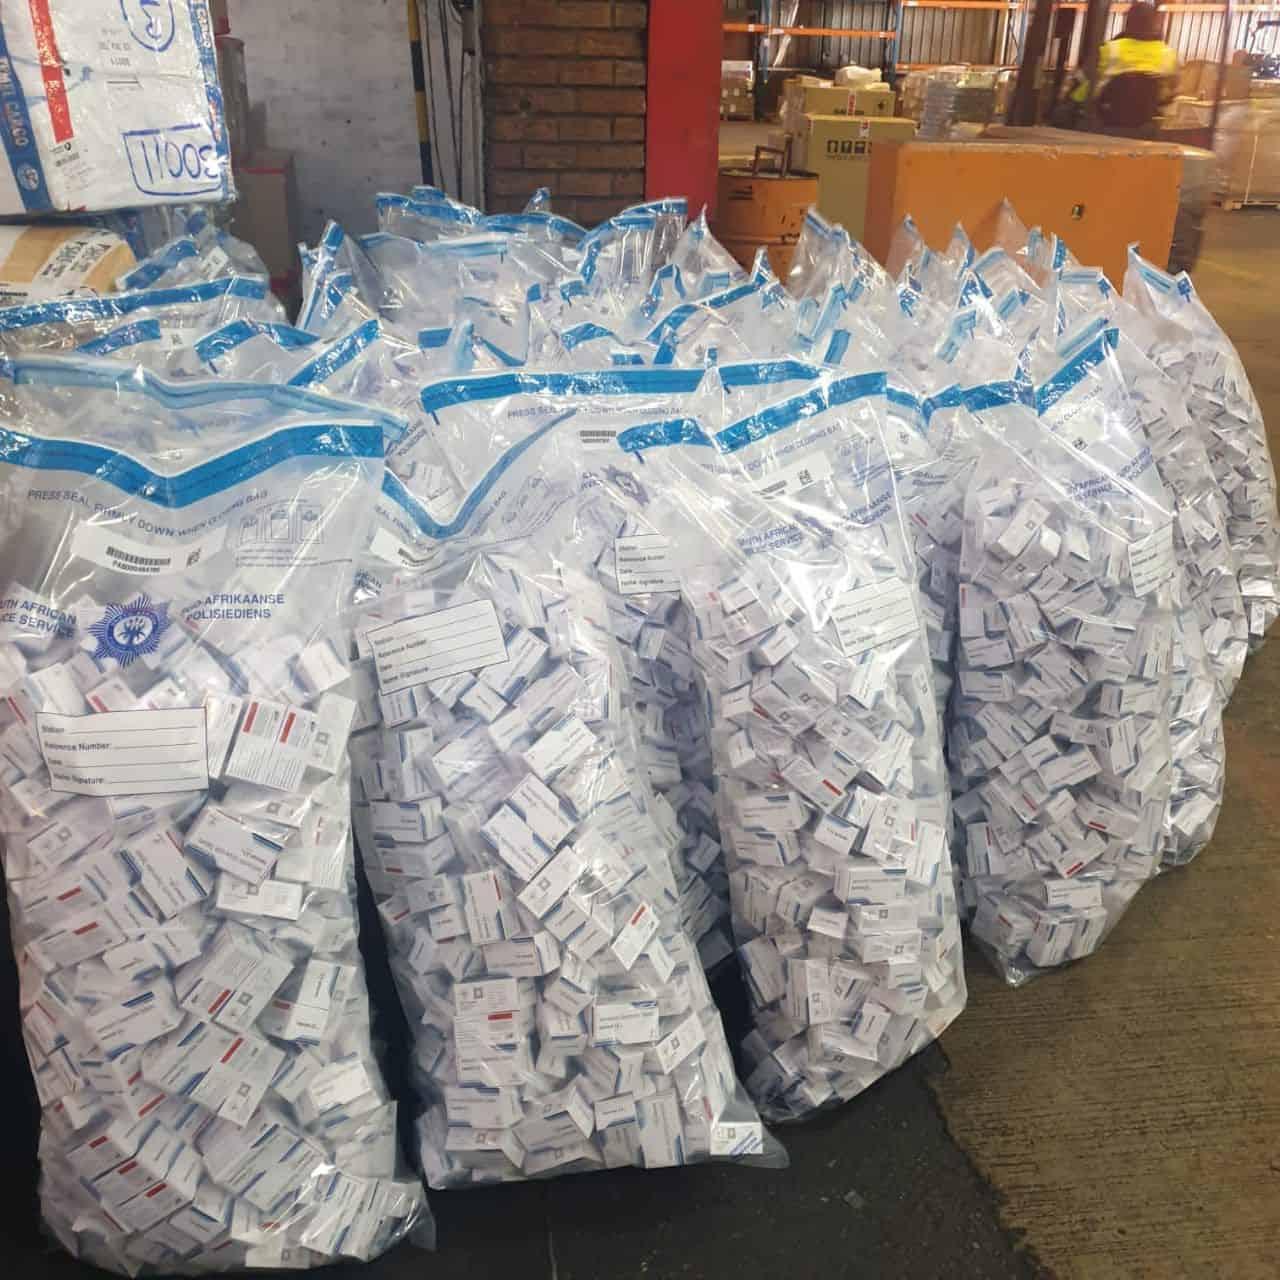 IMG 20210219 WA0000 - Ivermectin worth R126 million seized at OR Tambo International Airport